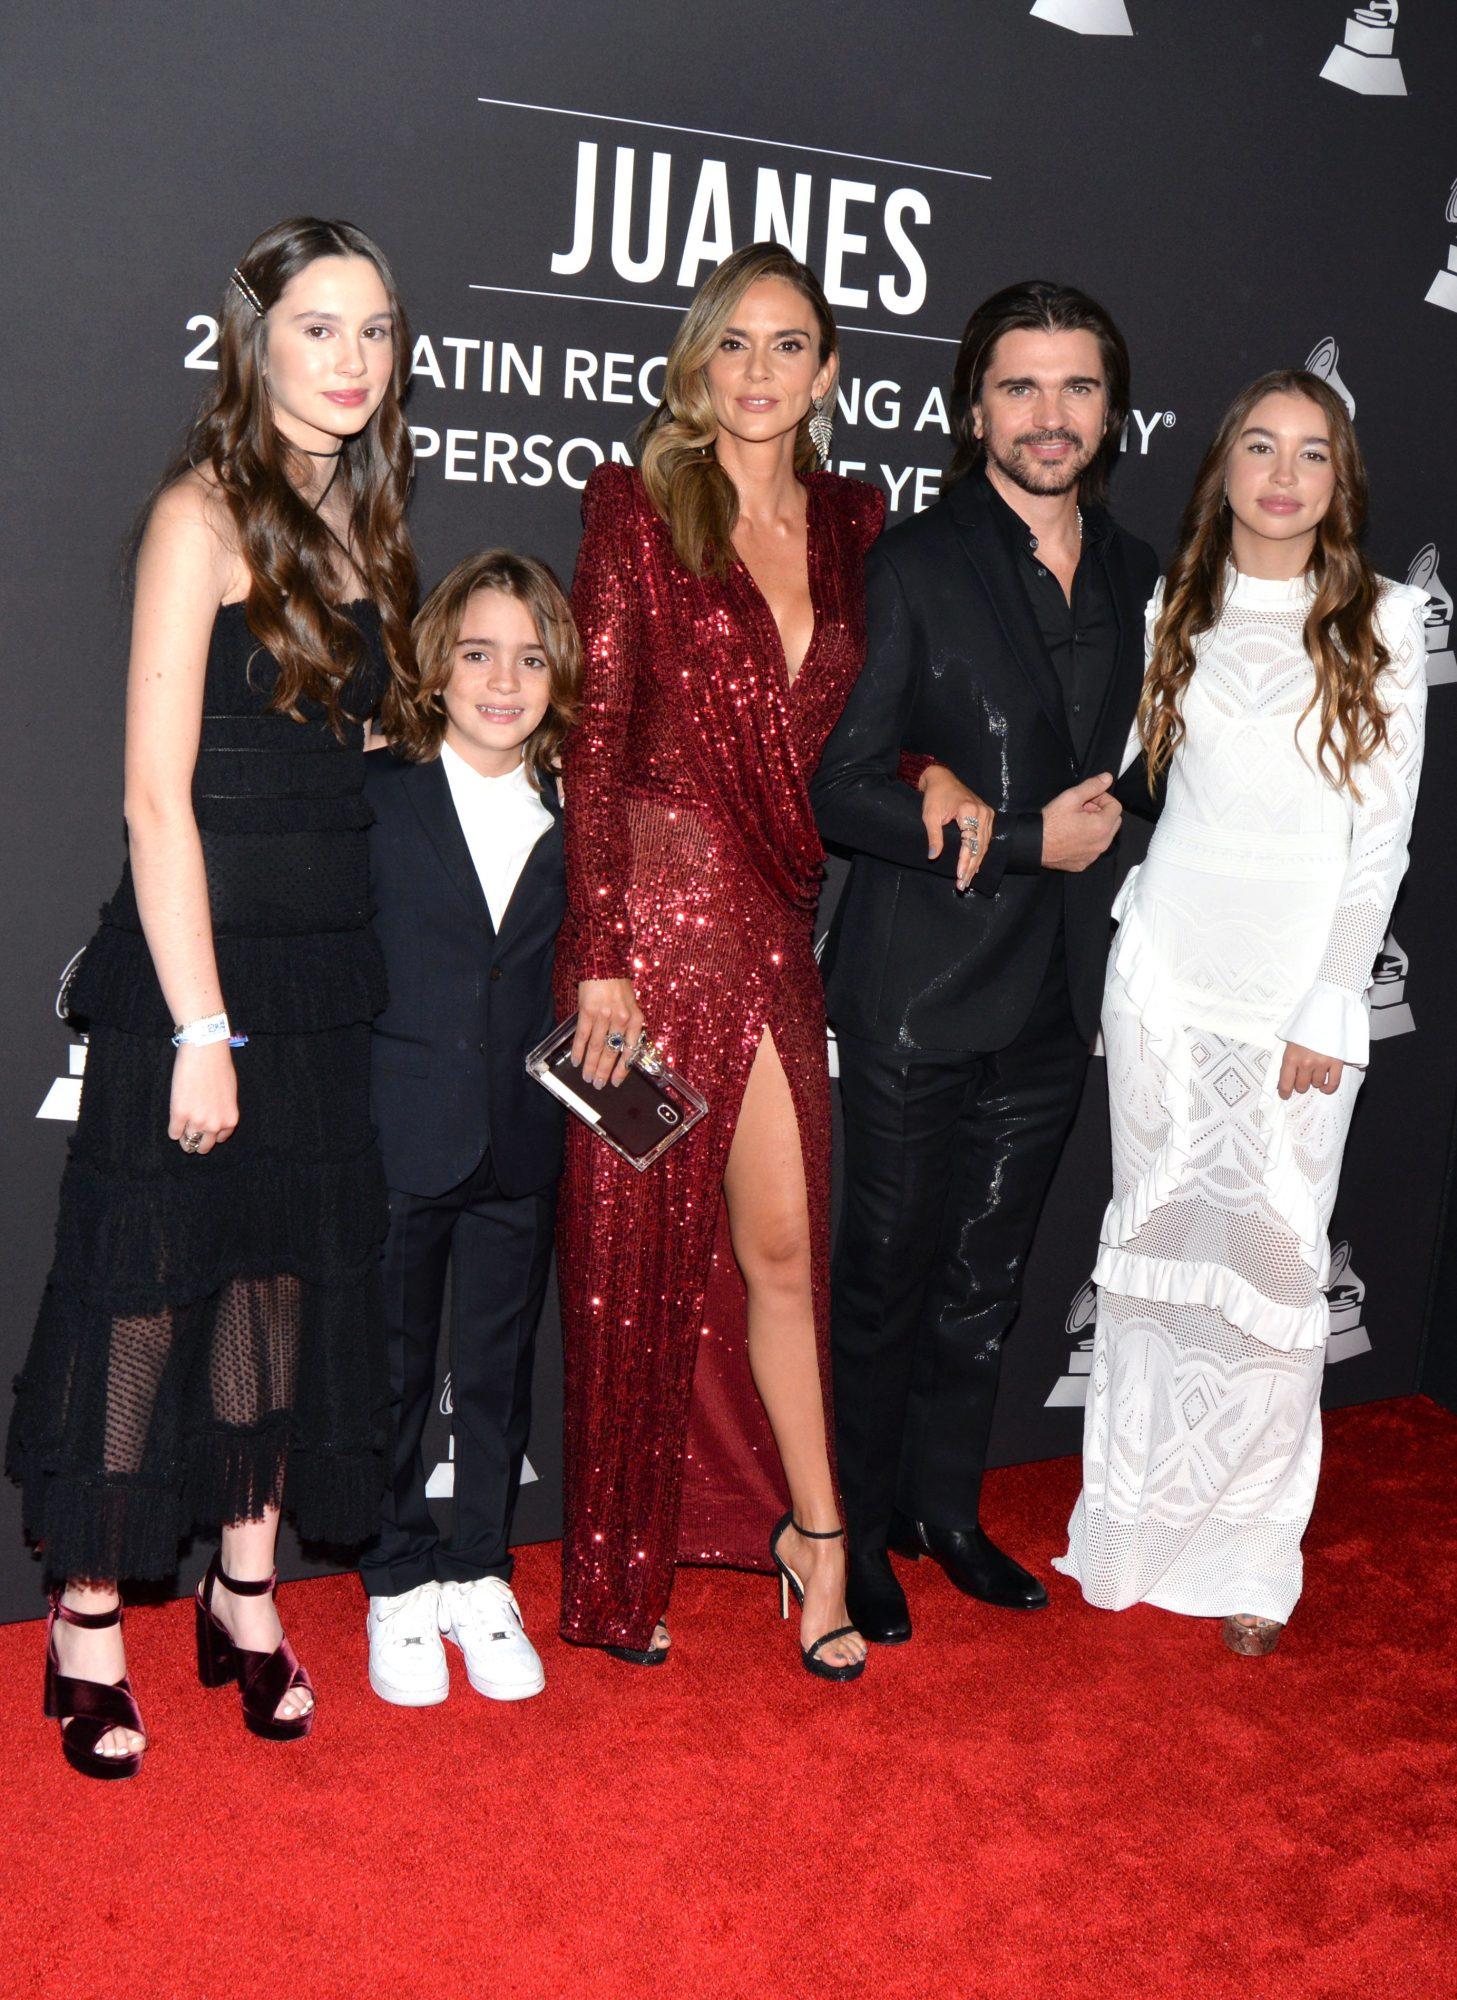 Juanes, Karina Martínez, Paloma, Dante, Luna